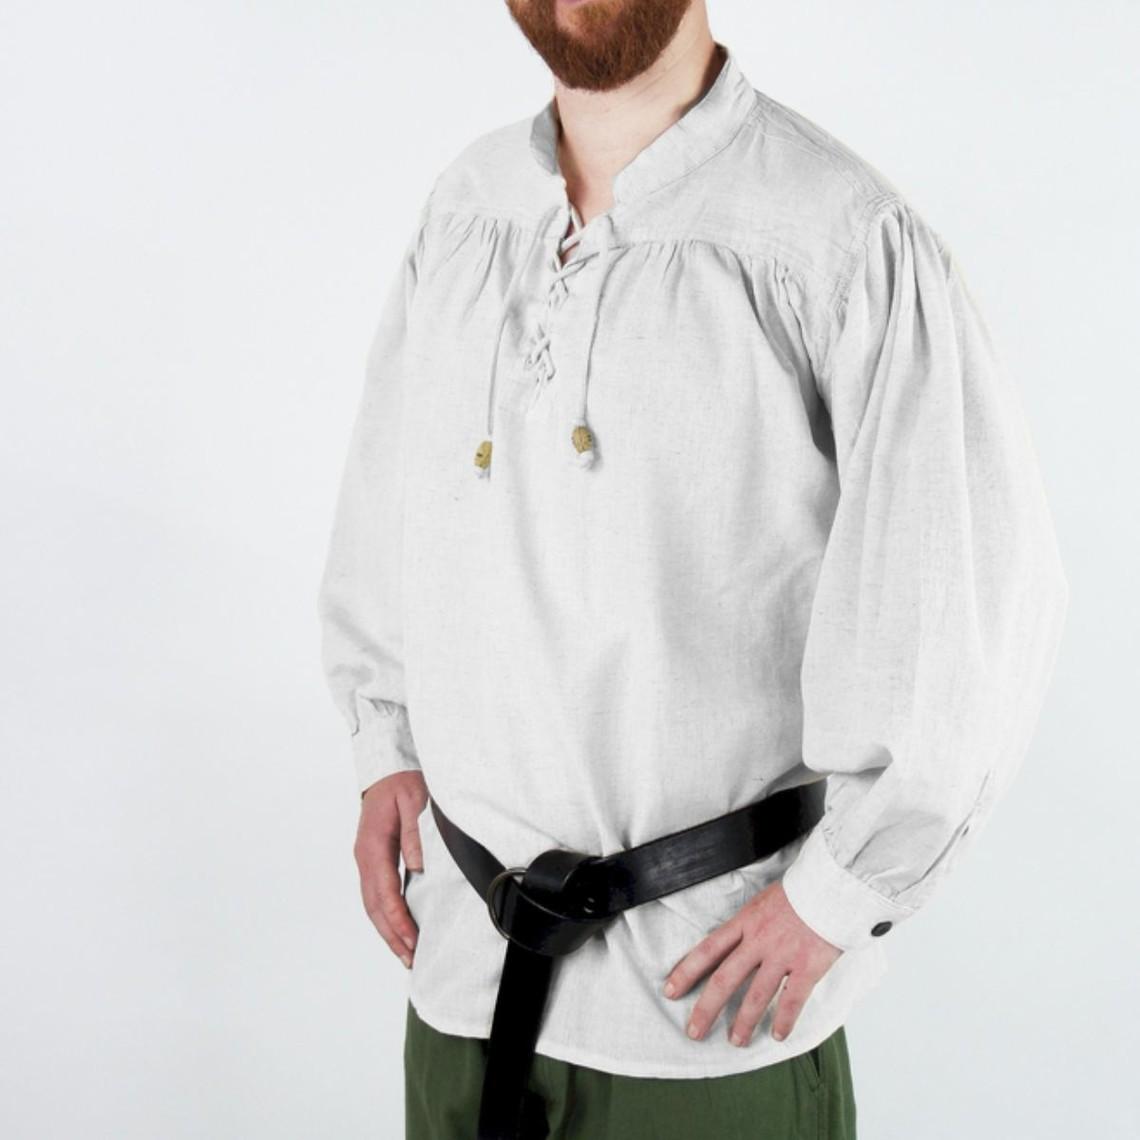 Leonardo Carbone Camicia medievale, bianca